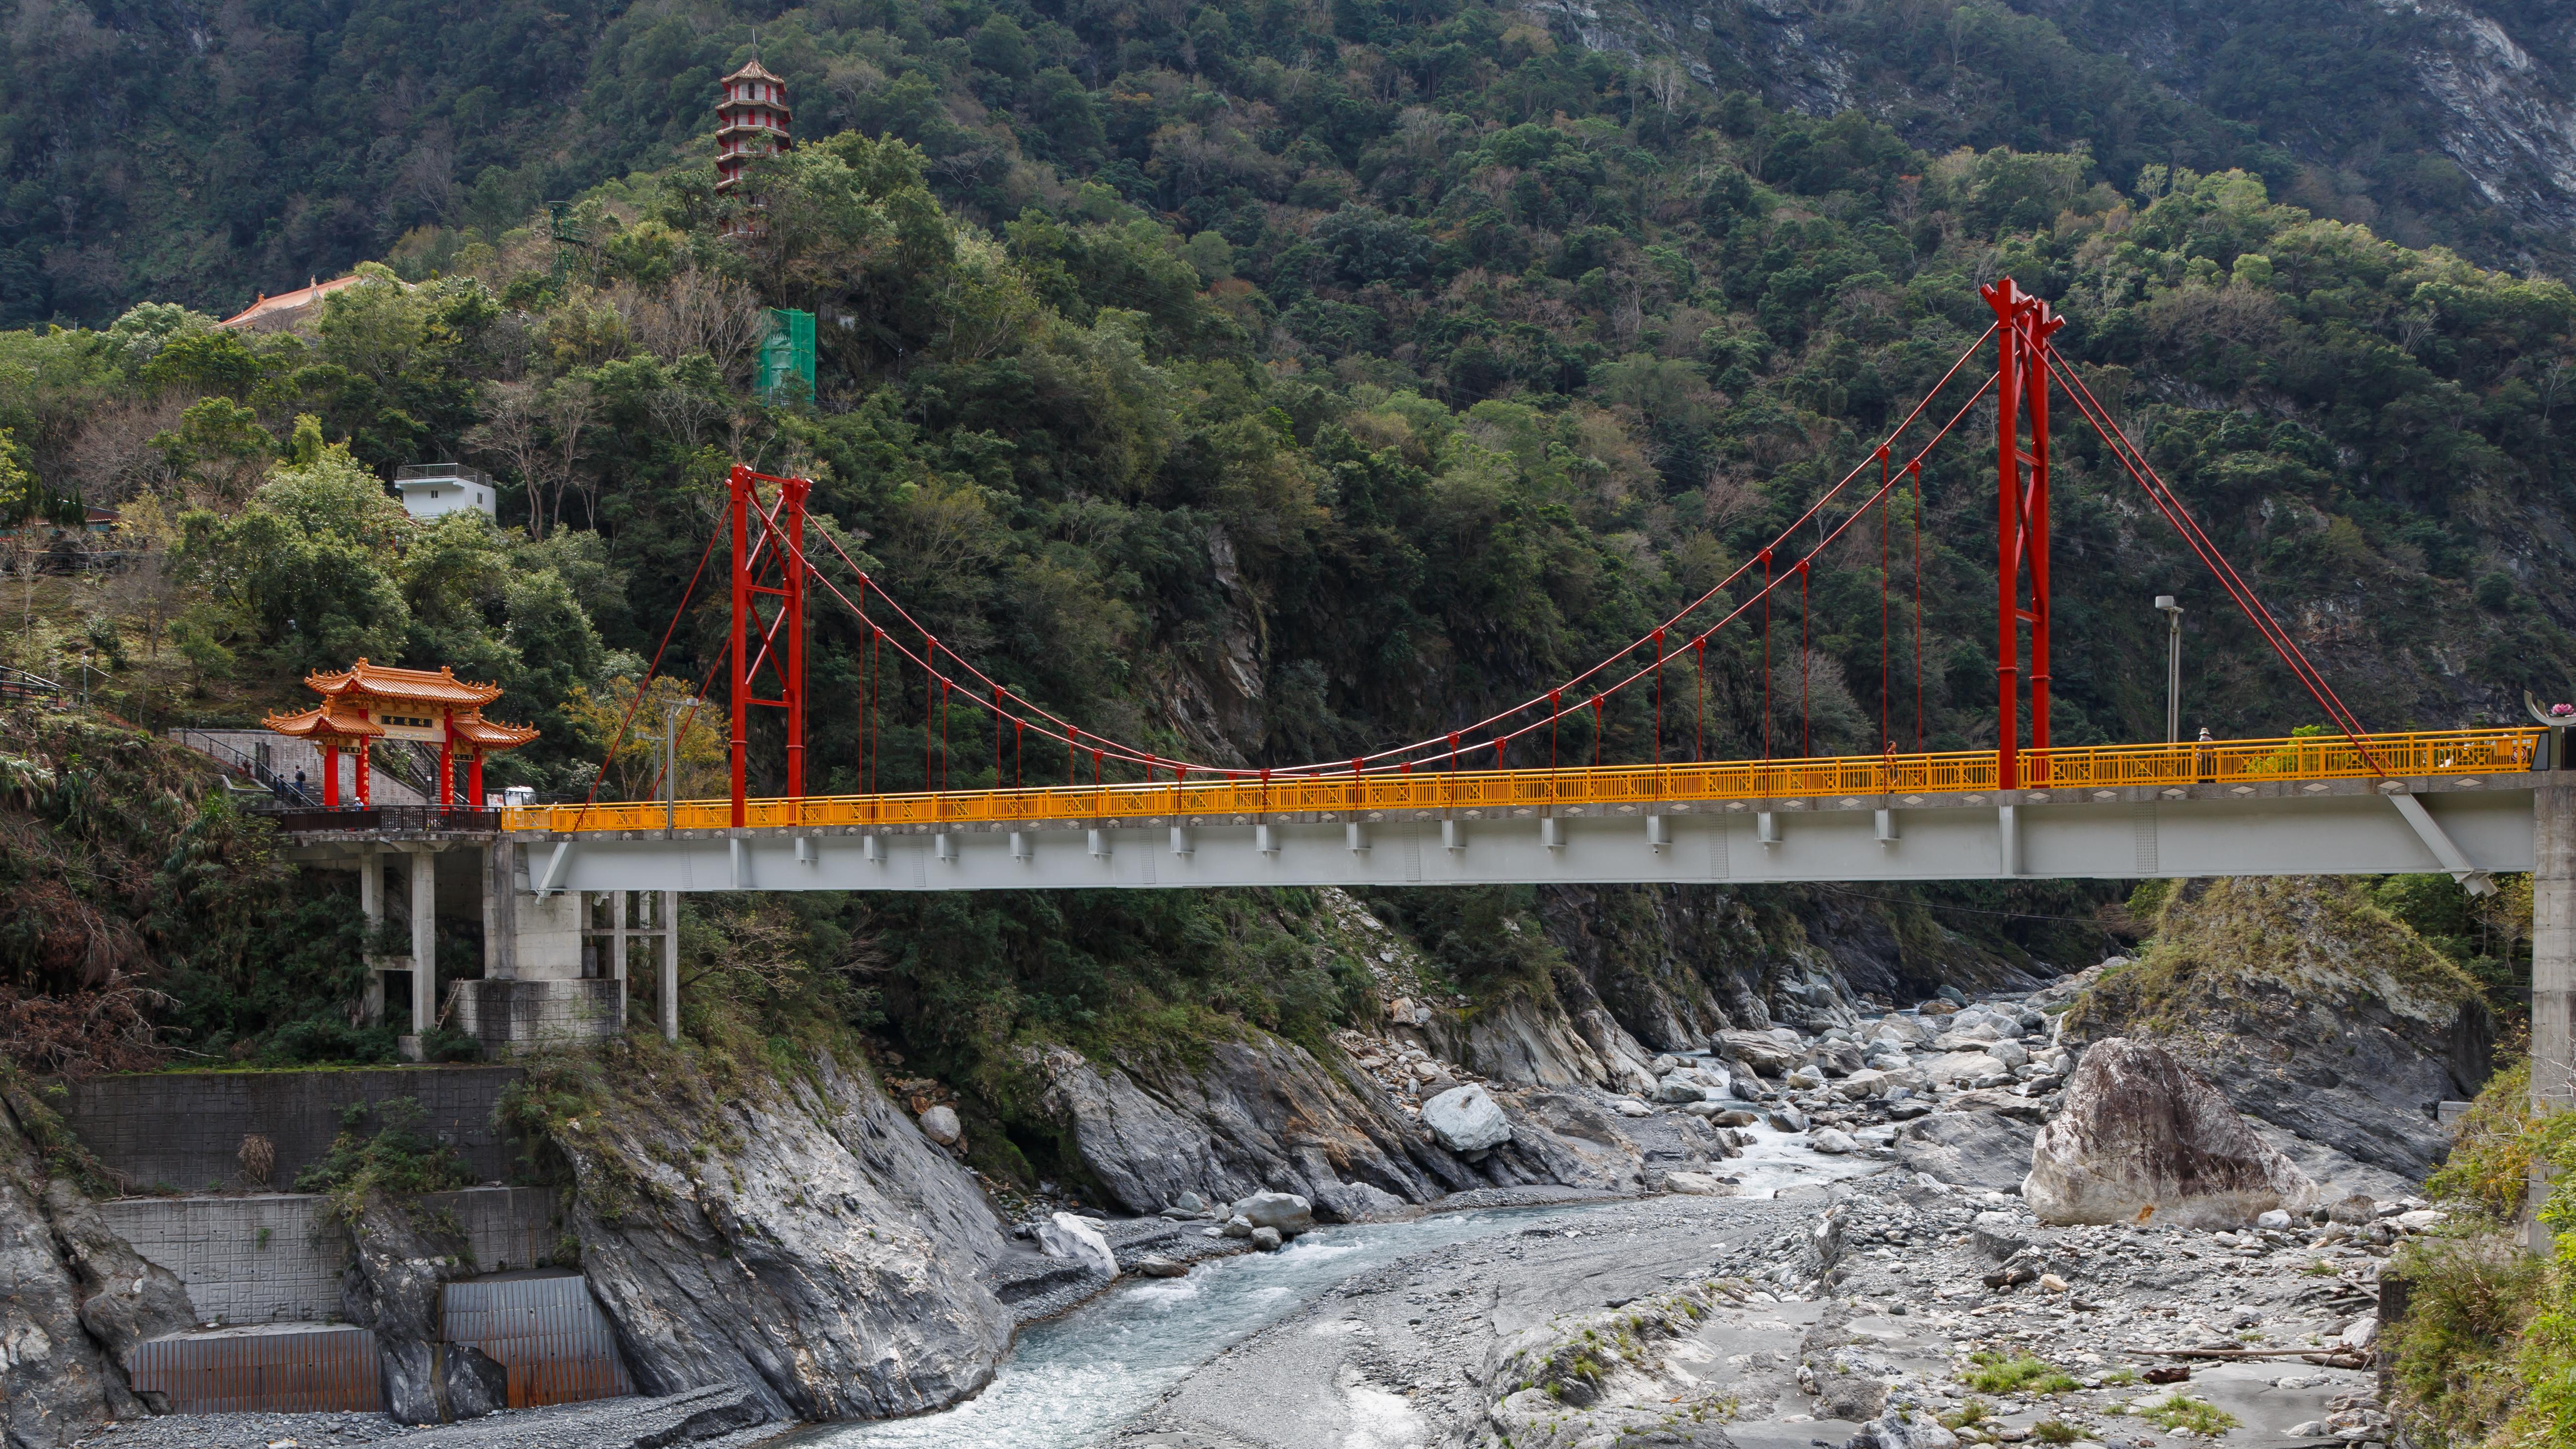 Taroko-Gorge Hualien Taiwan Pudu-Bridge-at-Taroko-National-Park-01.jpg